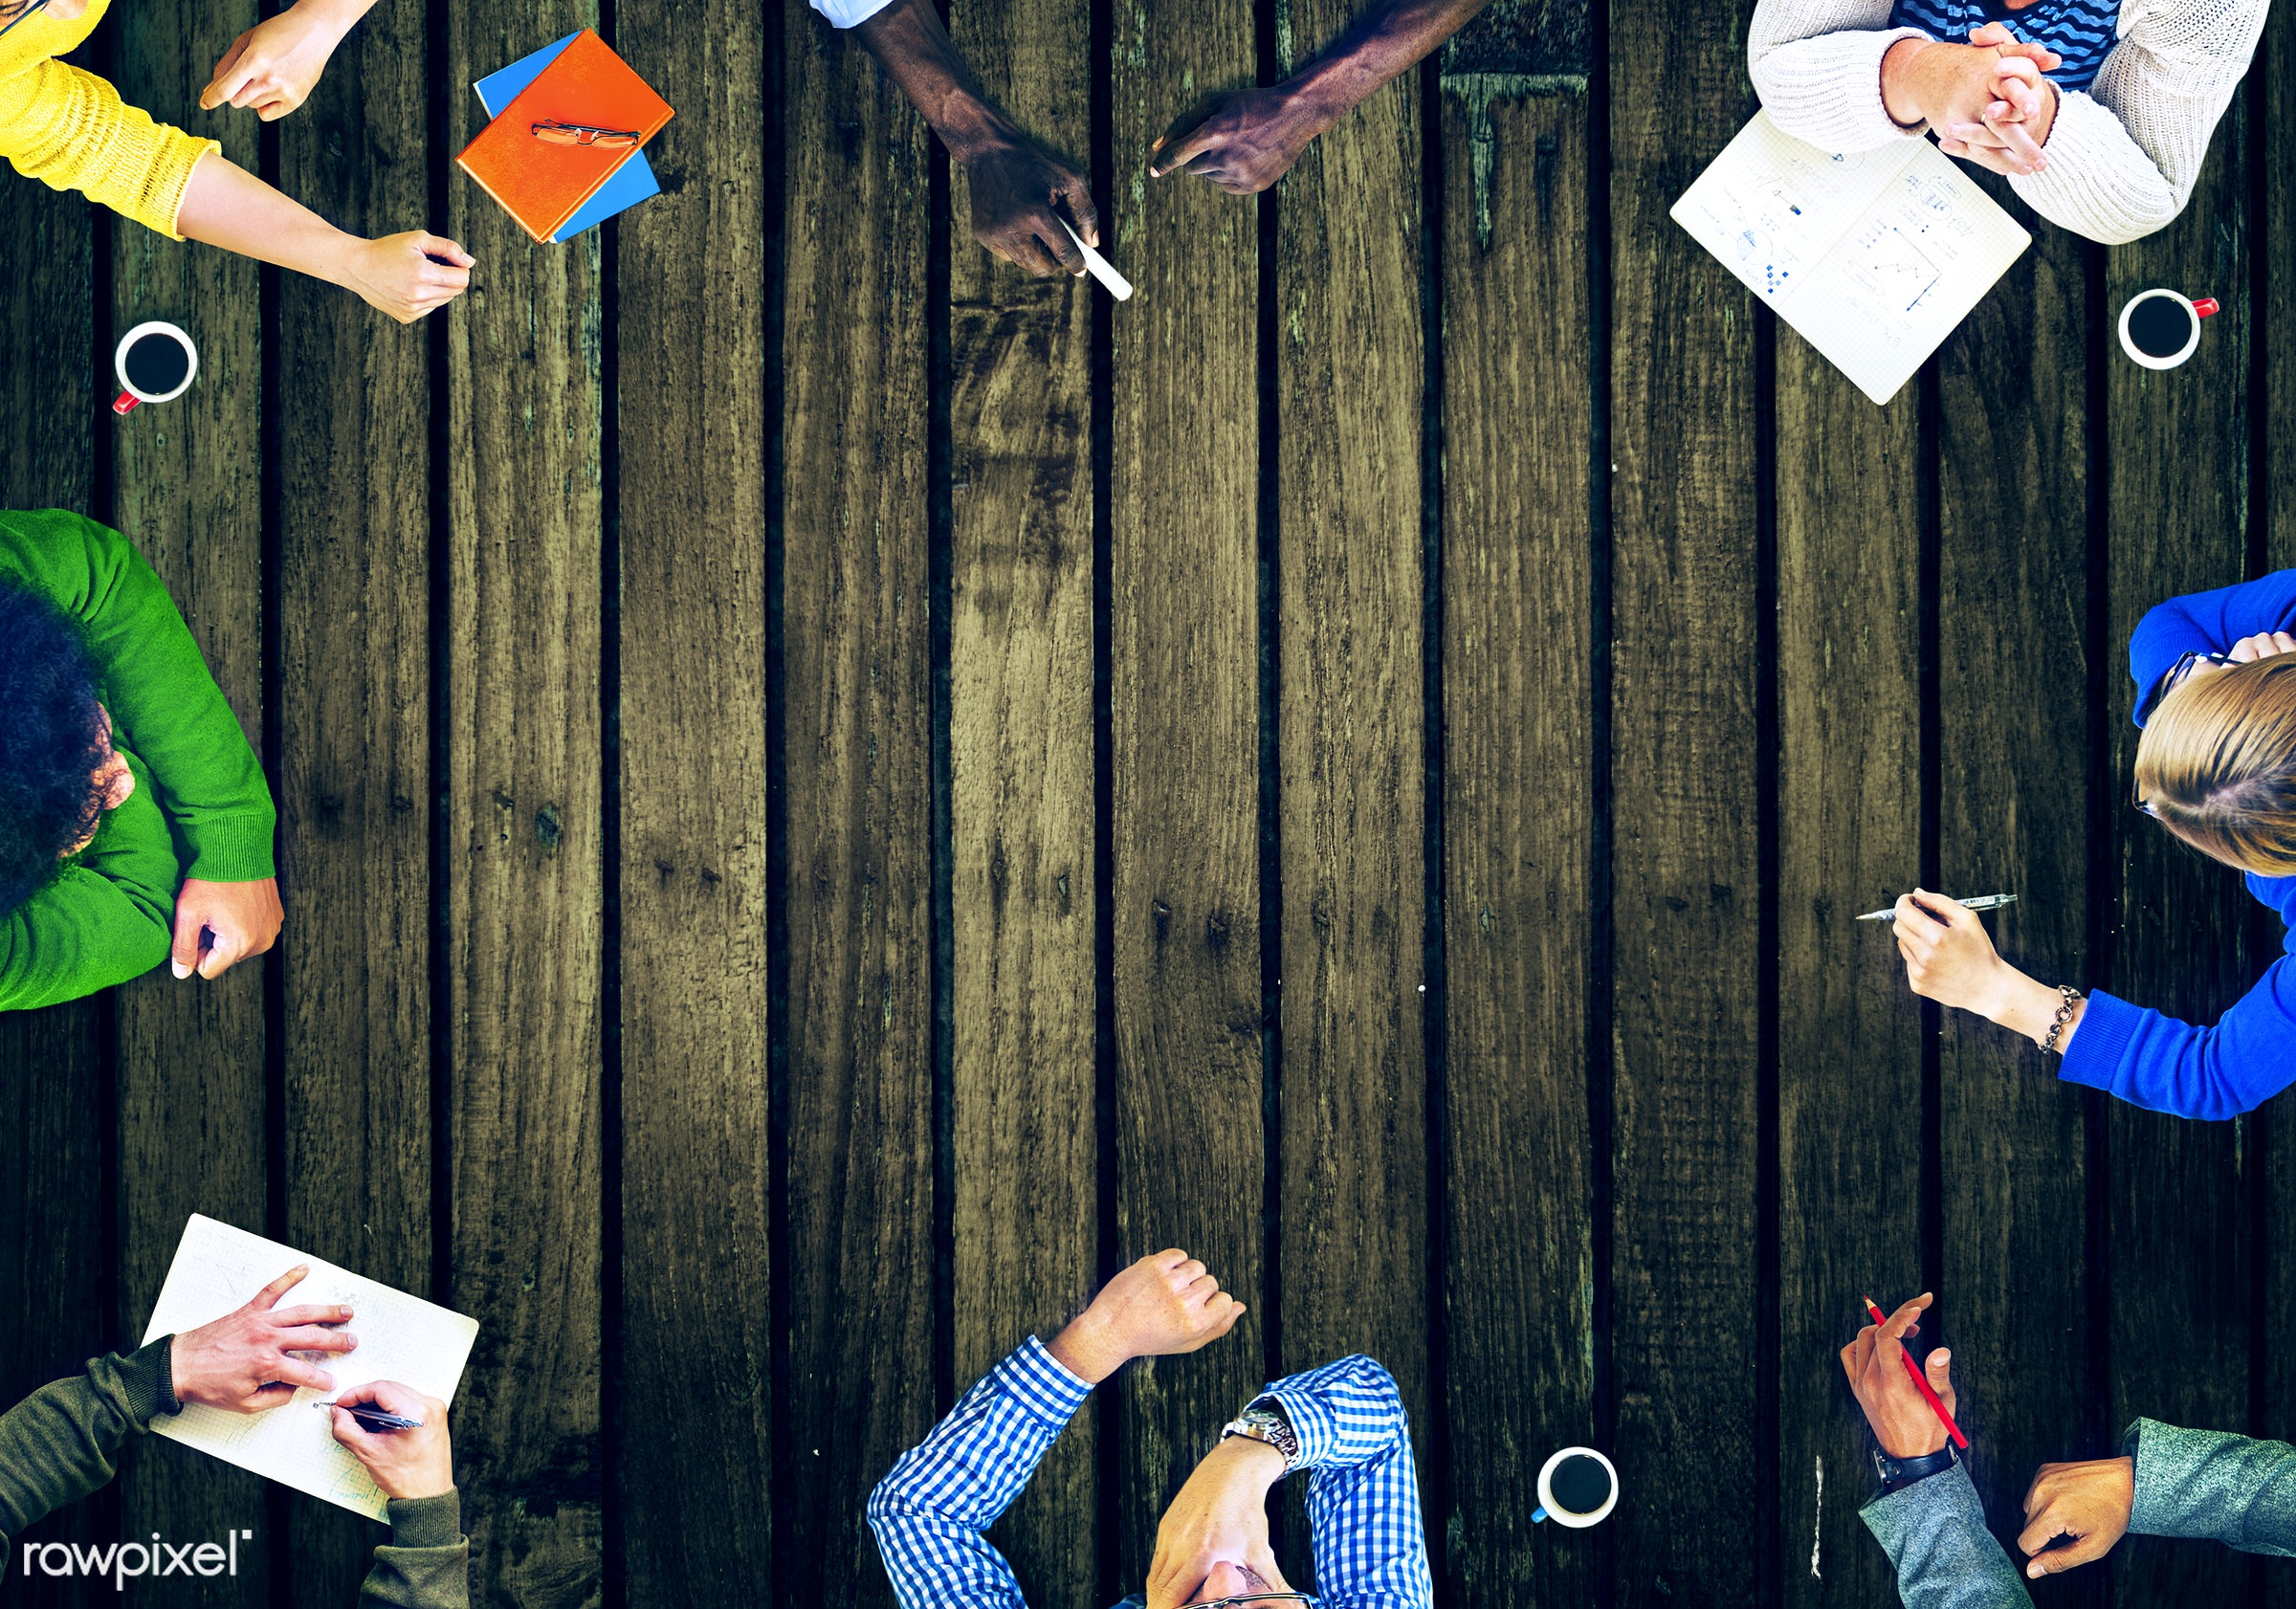 backgrounds, blank, brainstorming, business, businessmen, businesswomen, casual, classroom, college, communication, copy...